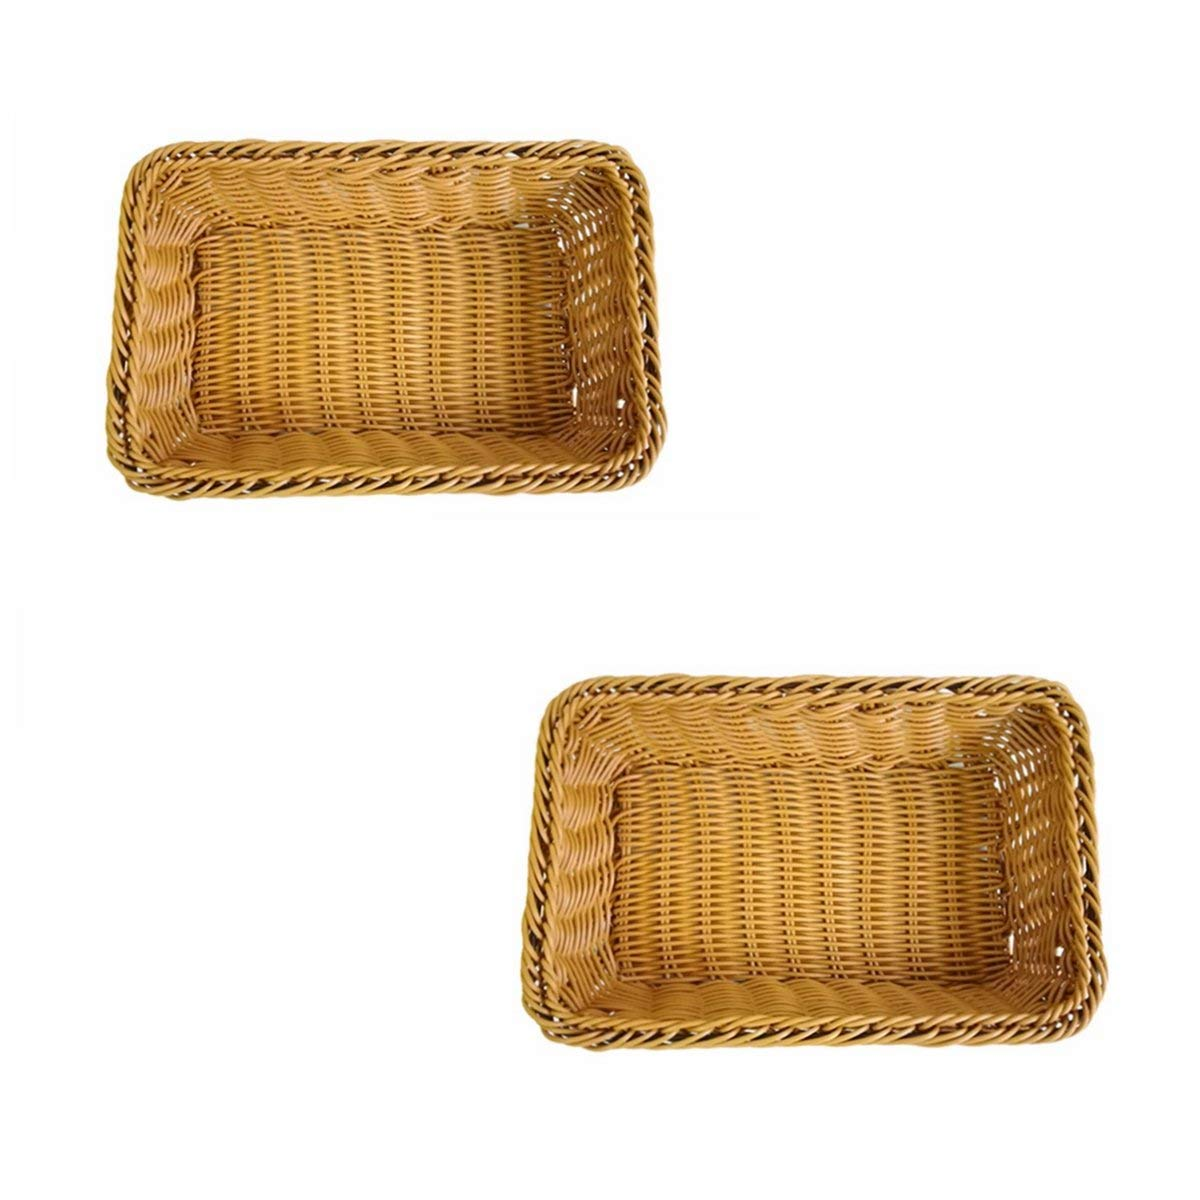 Set of 2, Small Size Woven Storage Baskets, Bread Fruit Serving Baskets, Gift Baskets, Restaurant/Pantry Display Baskets, Organization Baskets in Closet/Kitchen/Bathroom/Church/Dresser (2, Brown)